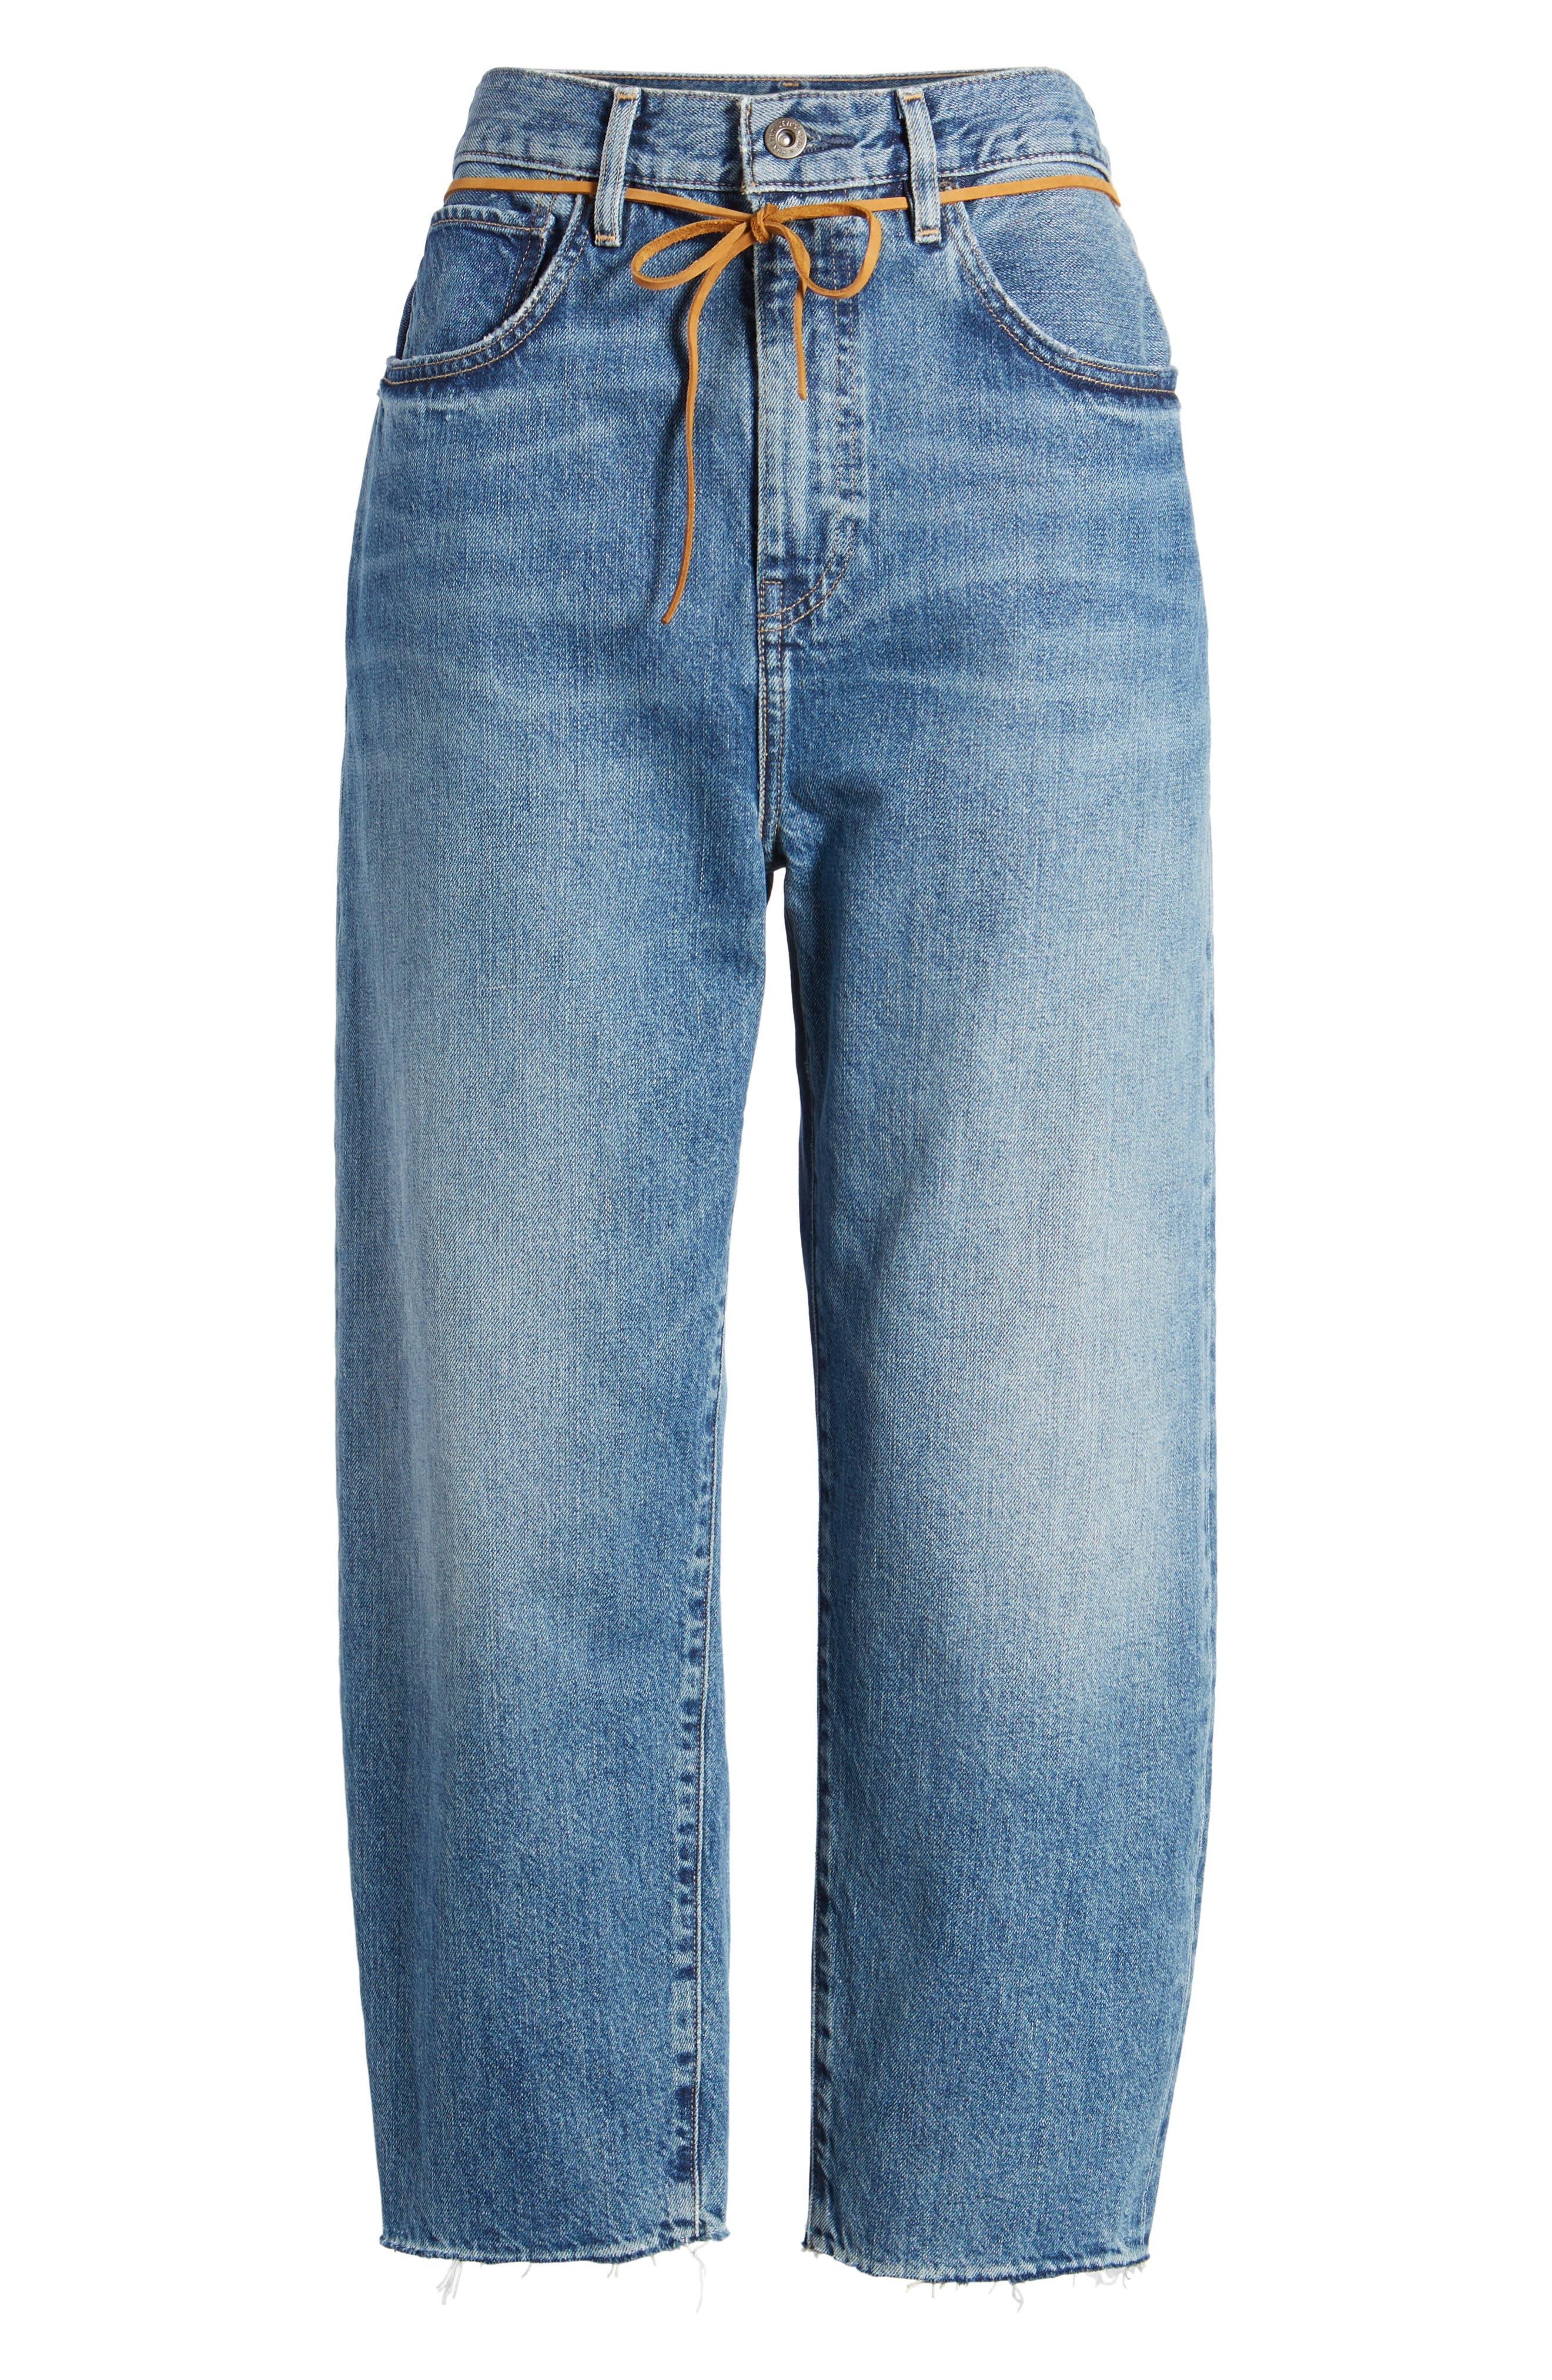 Barrel Jeans,                             Alternate thumbnail 7, color,                             420